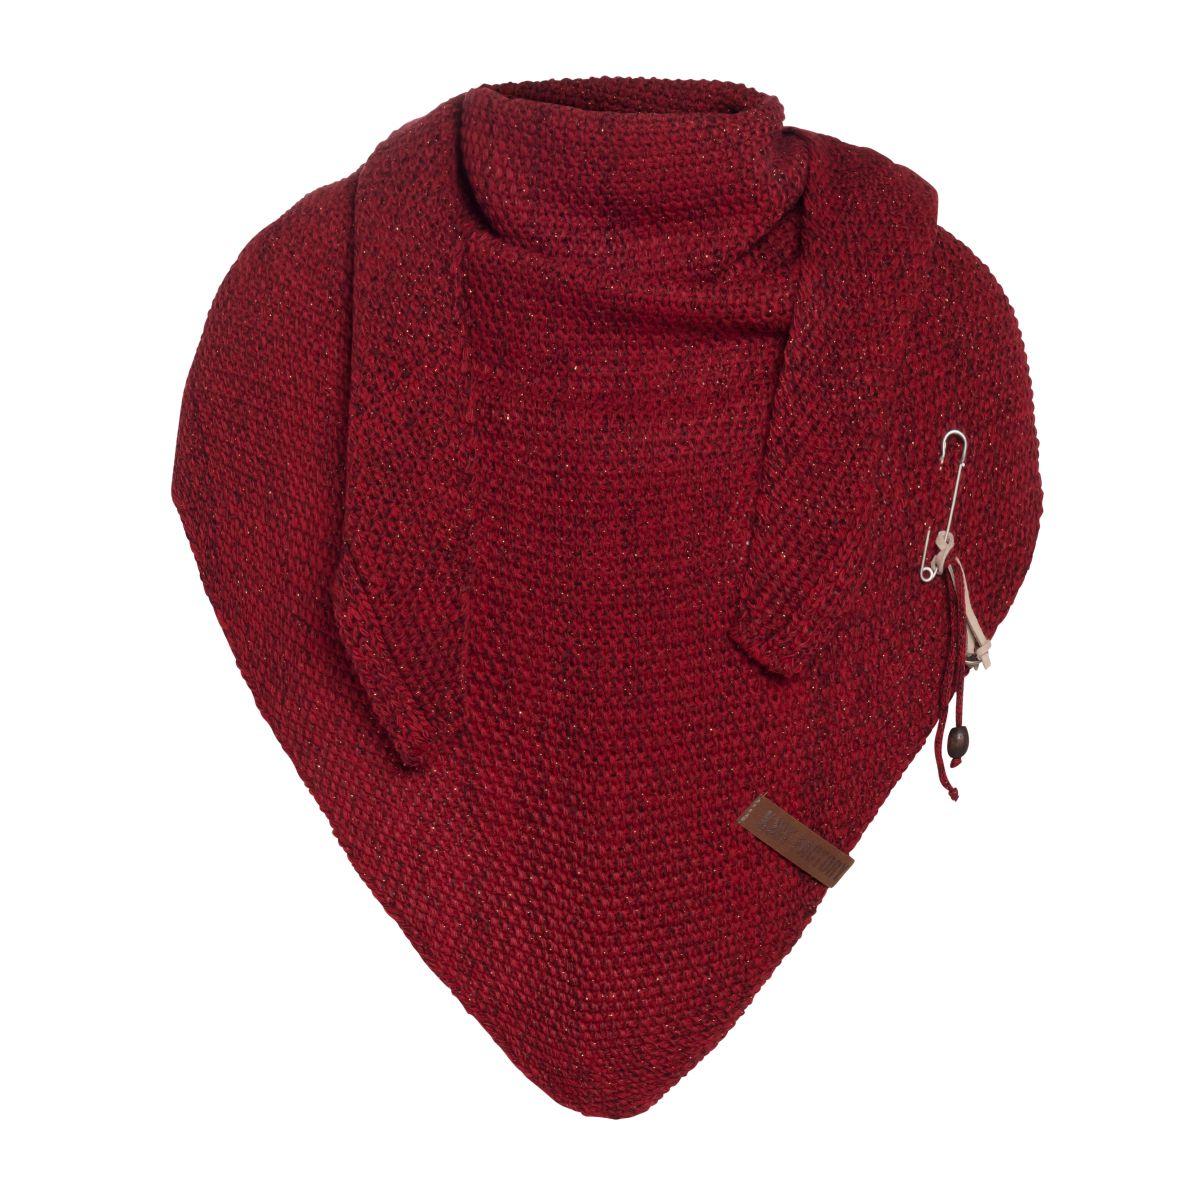 coco triangle scarf deluxe bordeaux